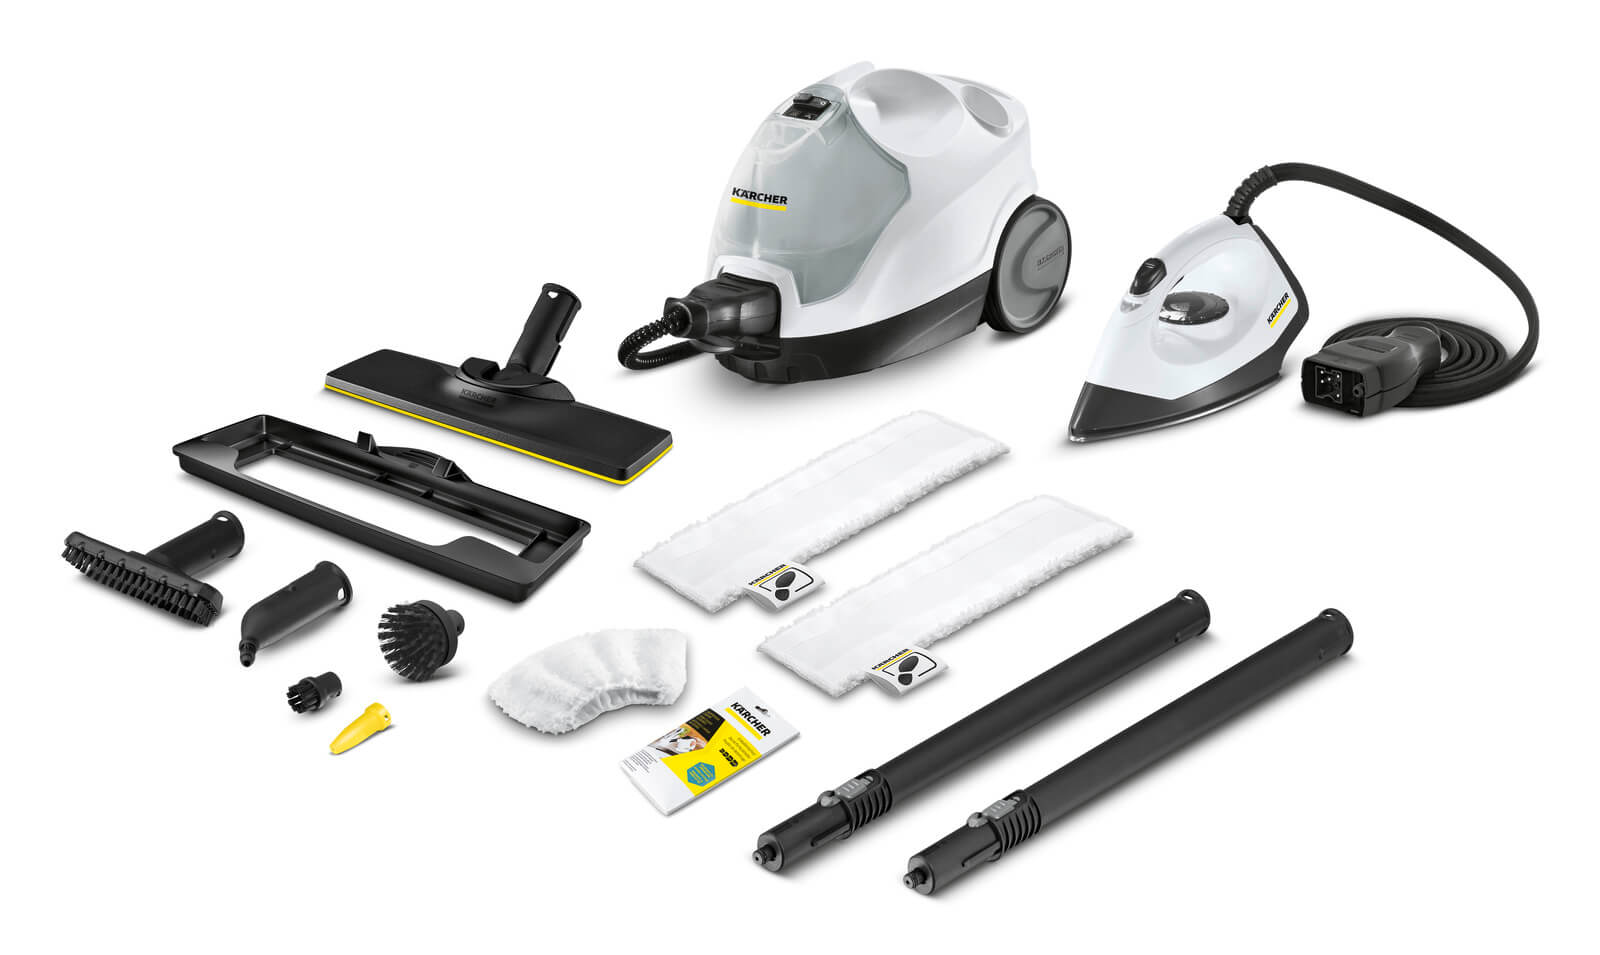 Пароочиститель Karcher SC 4 EasyFix Premium Iron (white)